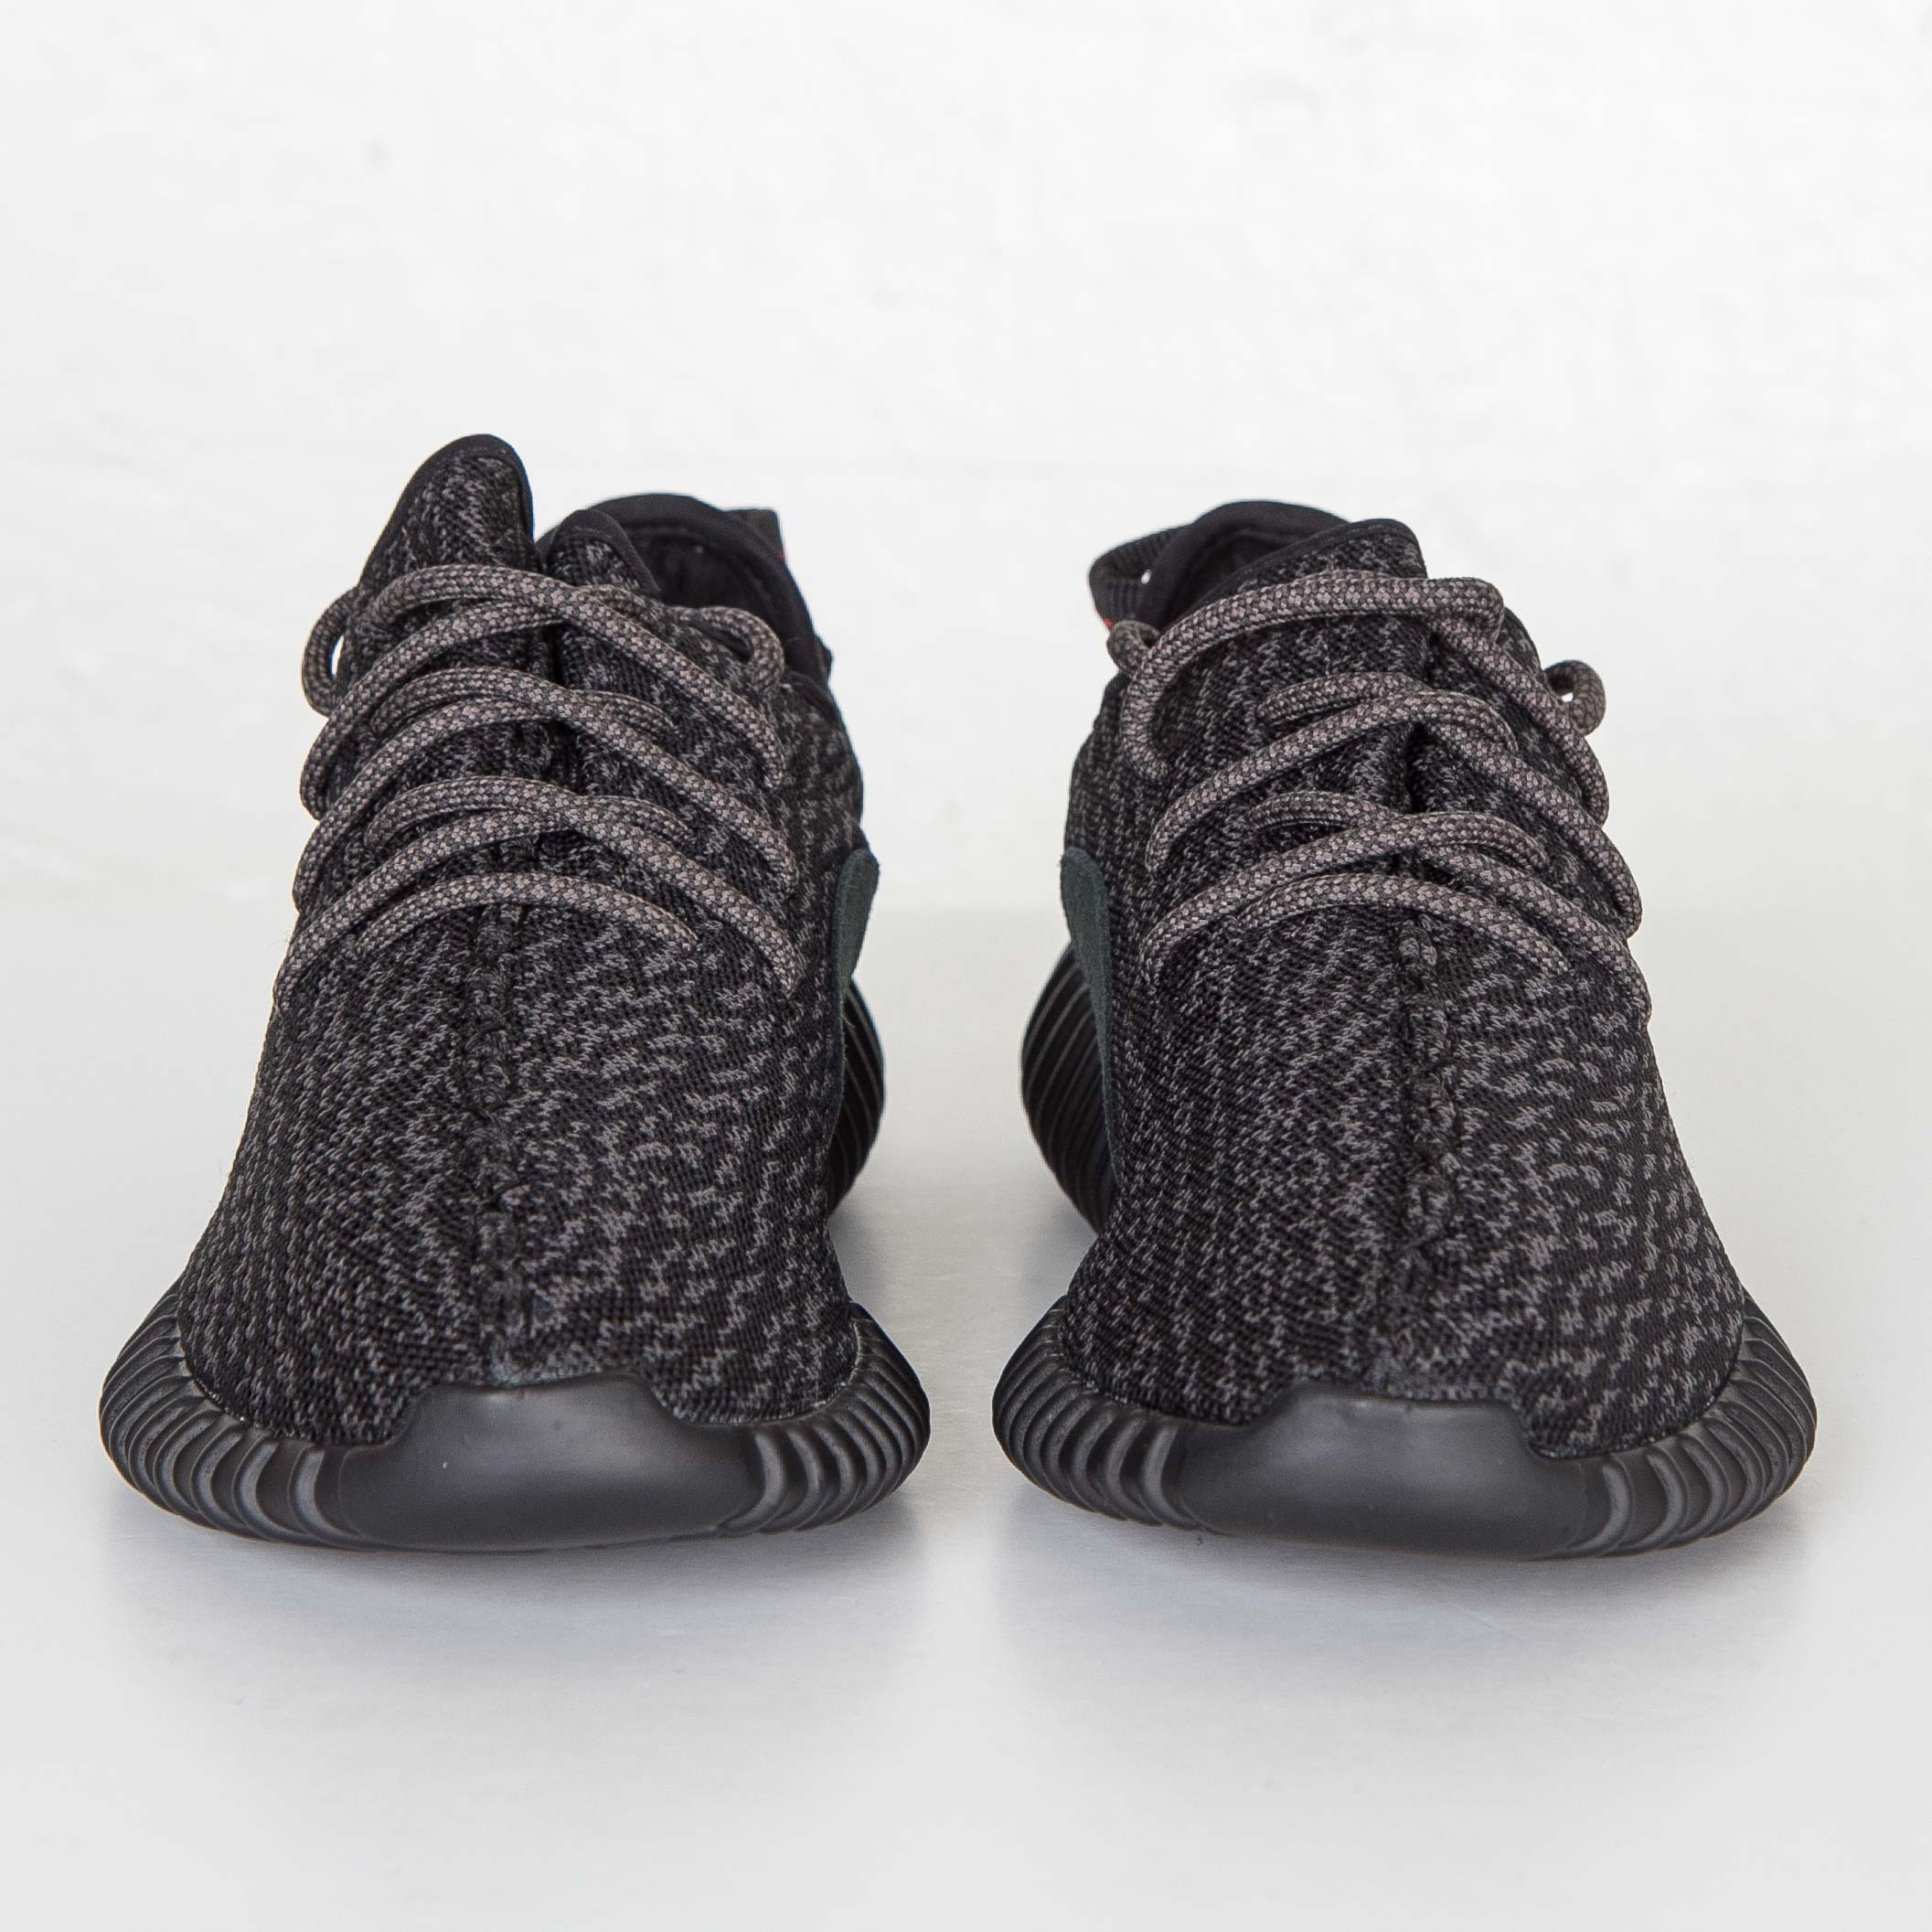 734f1b30ec262 adidas Yeezy Boost 350 - Bb5350 - Sneakersnstuff